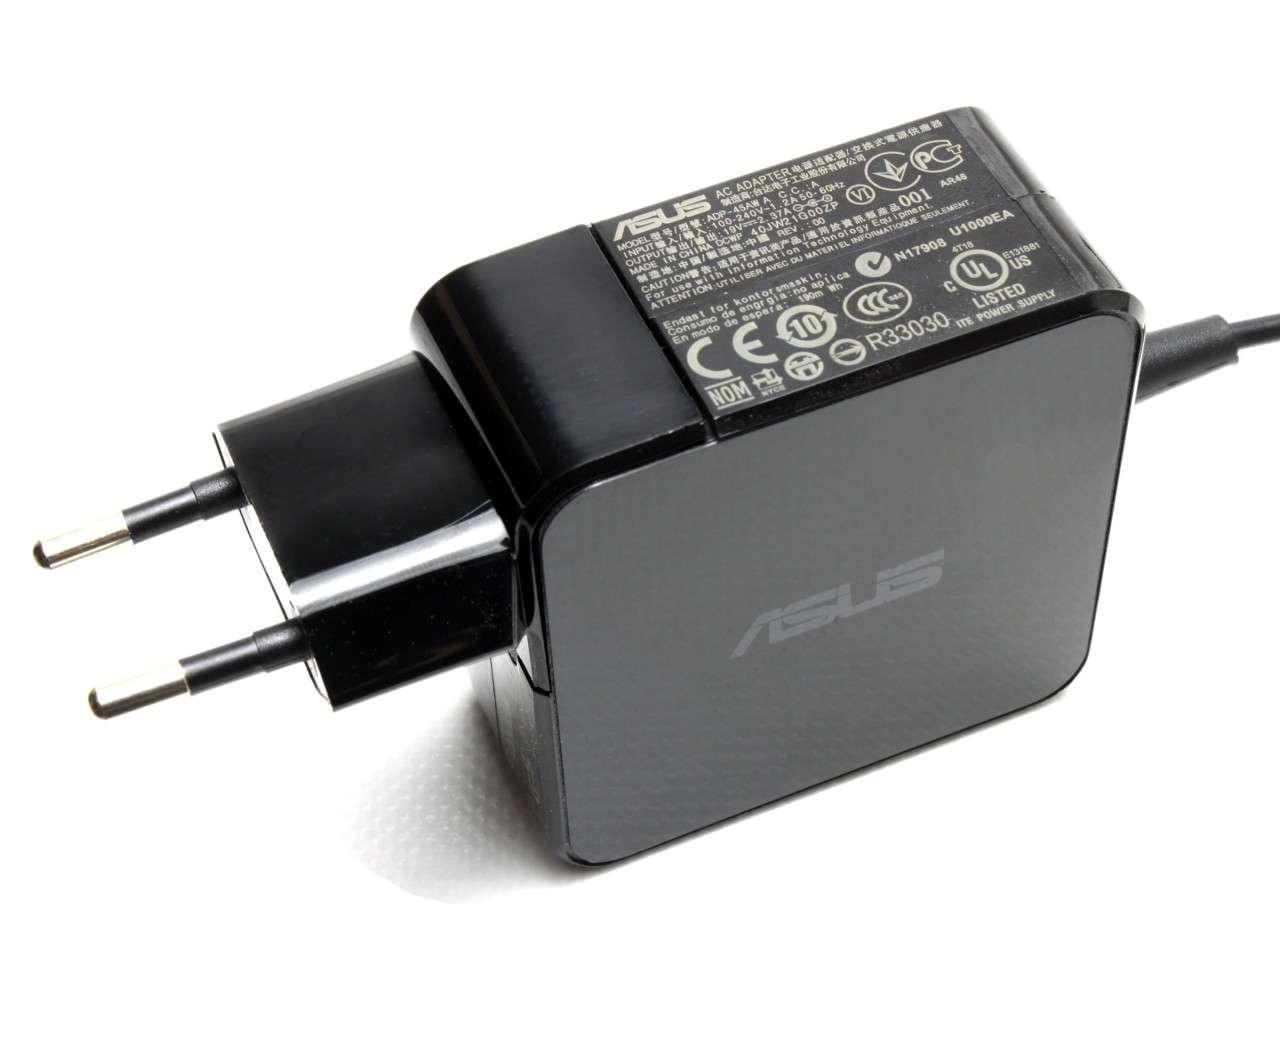 Incarcator Asus ZenBook UX21A DB5x 45W imagine